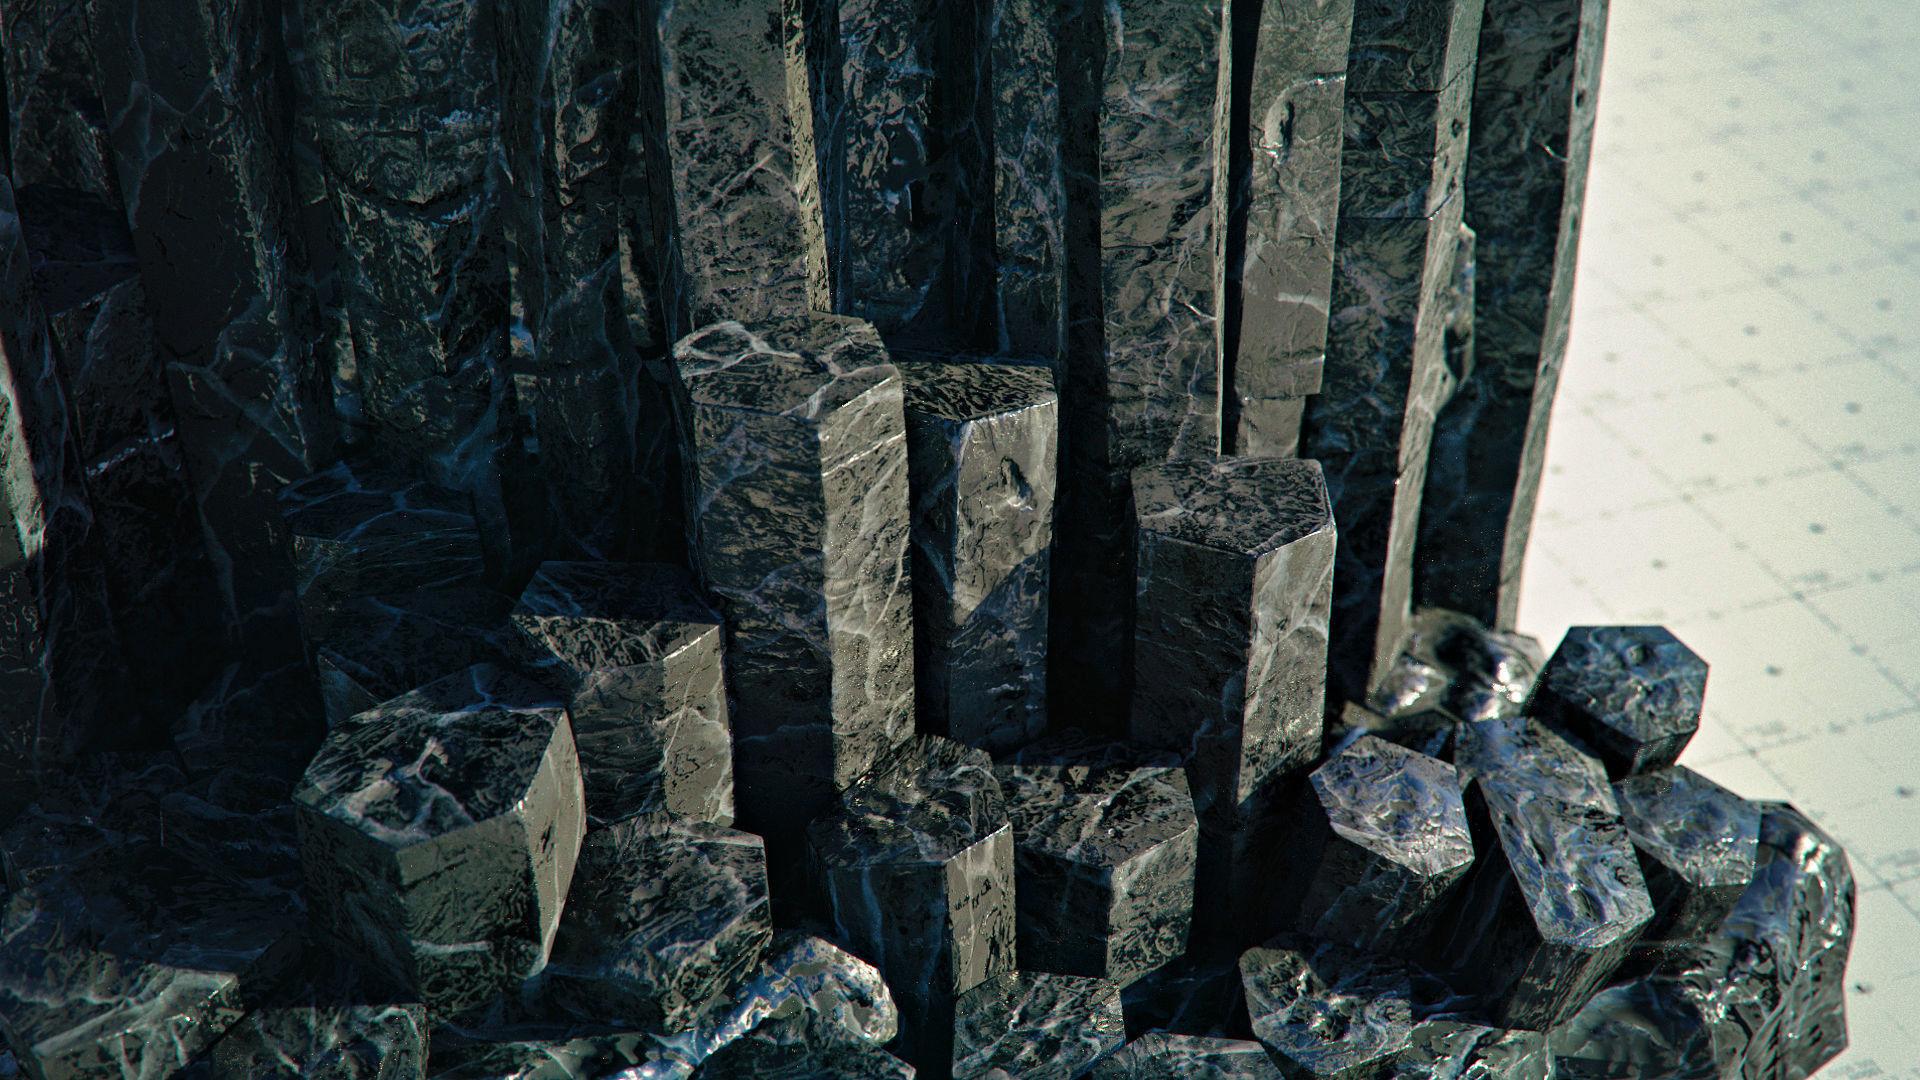 Basalt Columns and Rocks Kit PBR - Obsidian